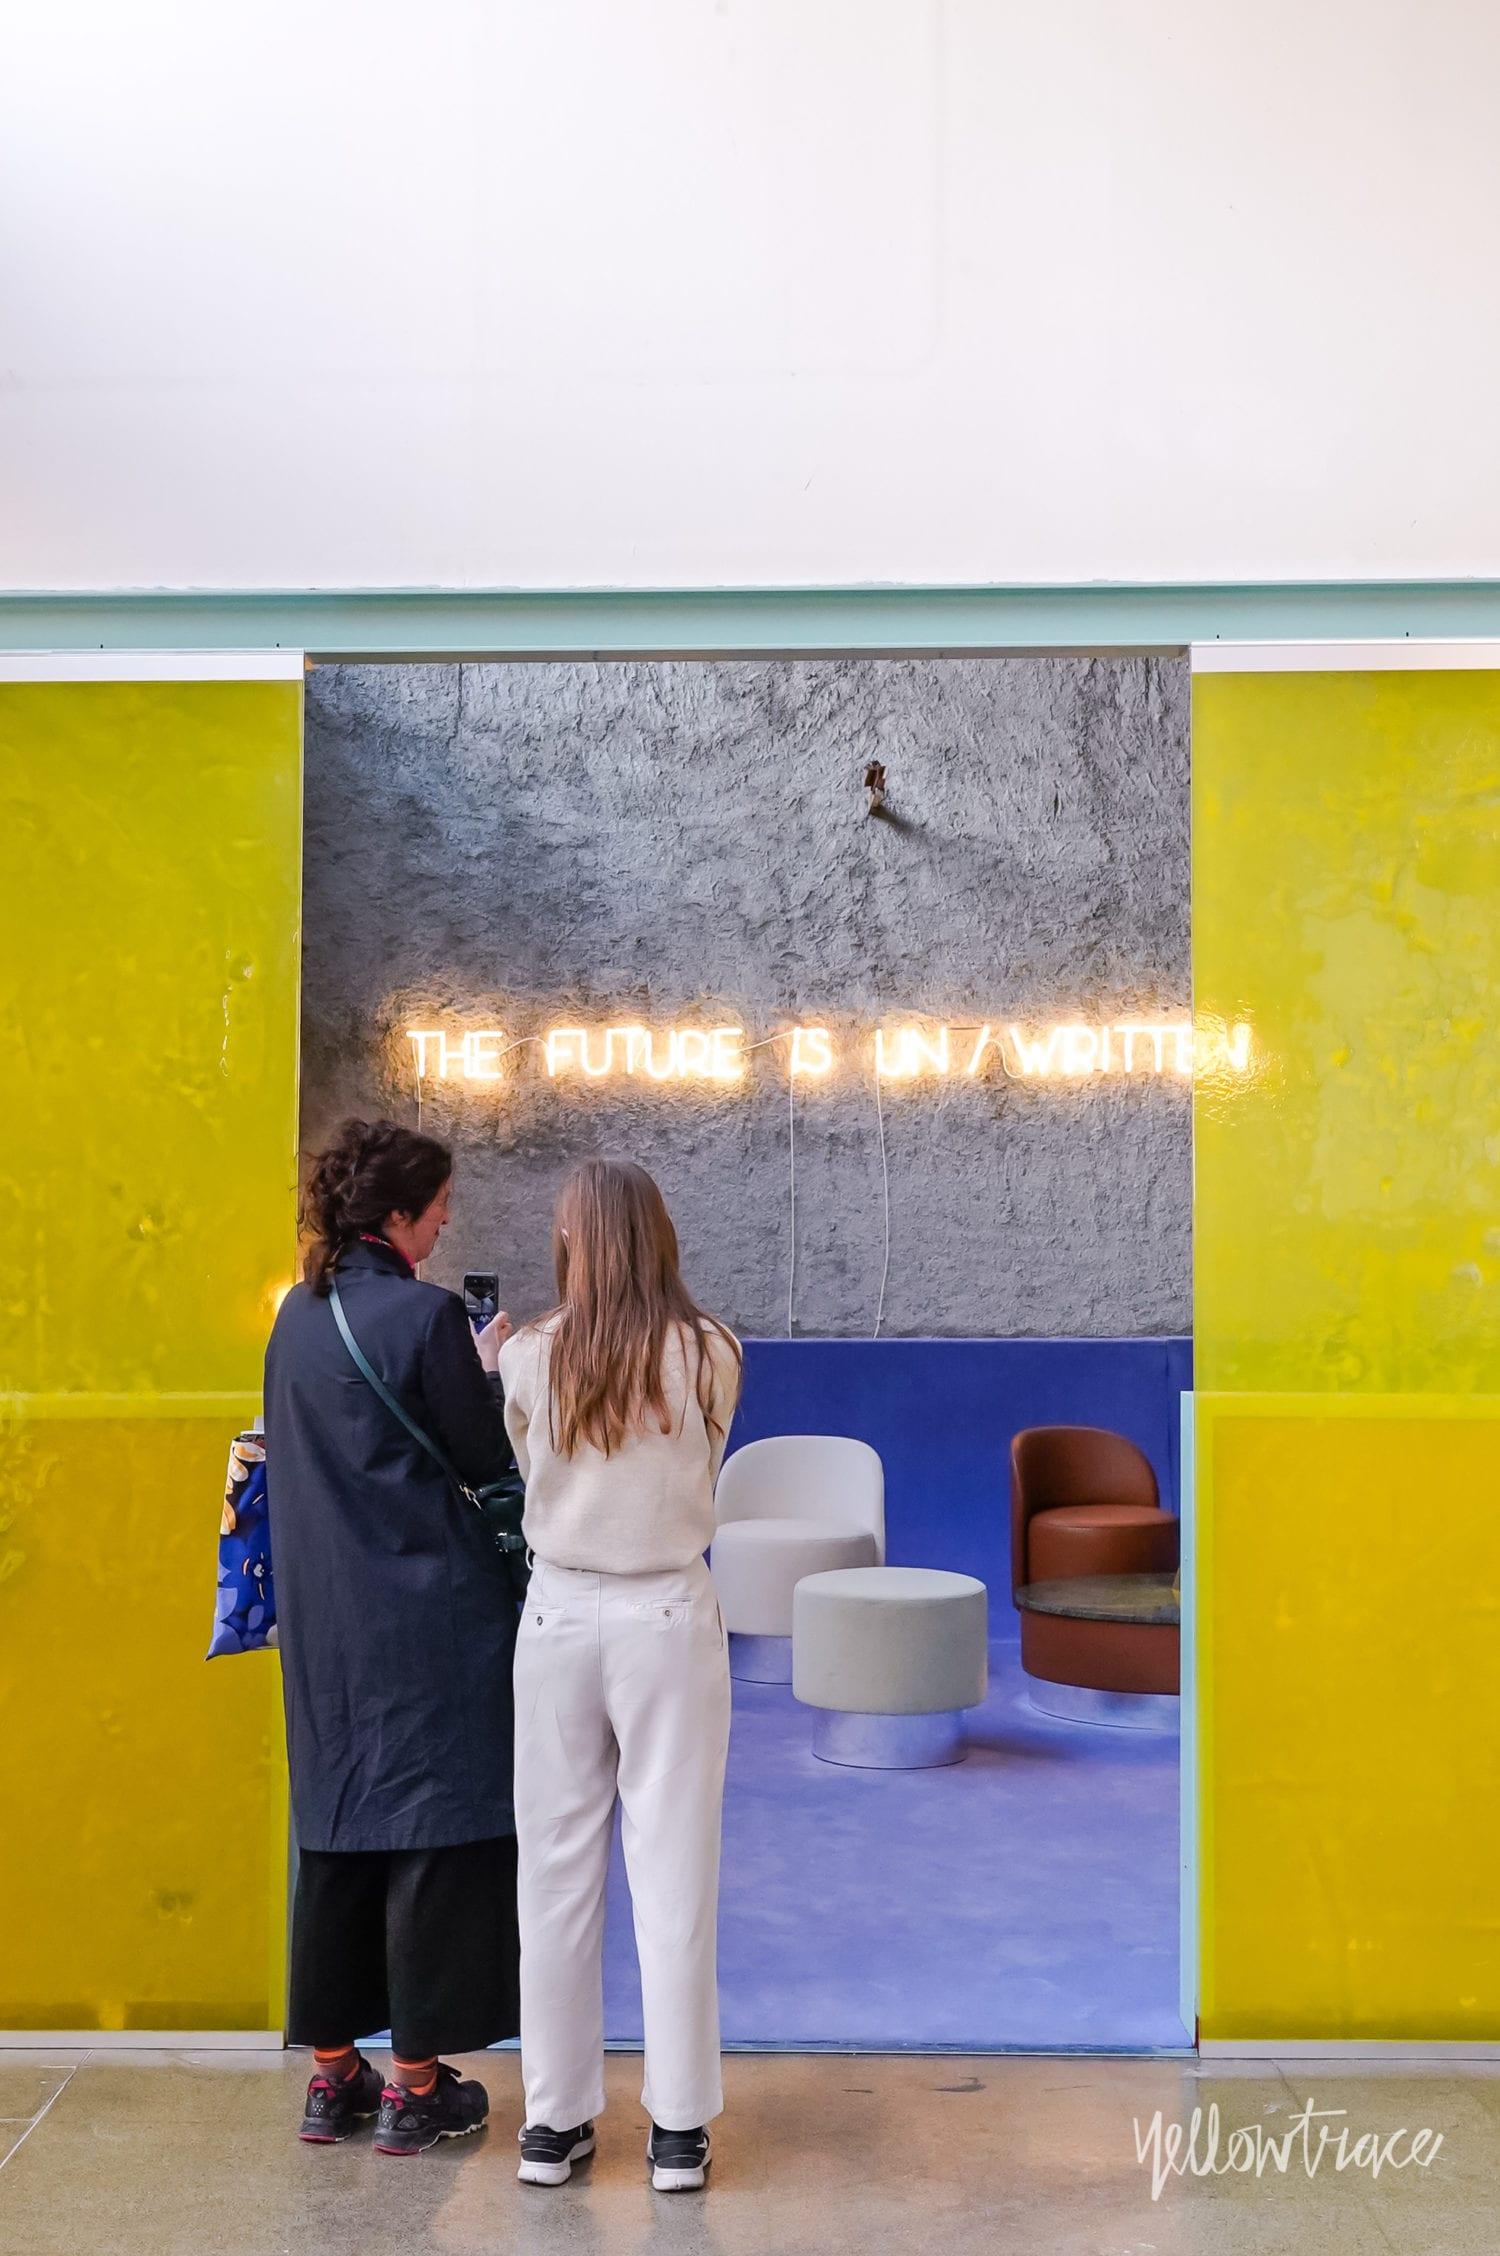 Les Arcanistes Studiopepe At Milan Design Week 2019 Photo Nick Hughes Yellowtrace 24